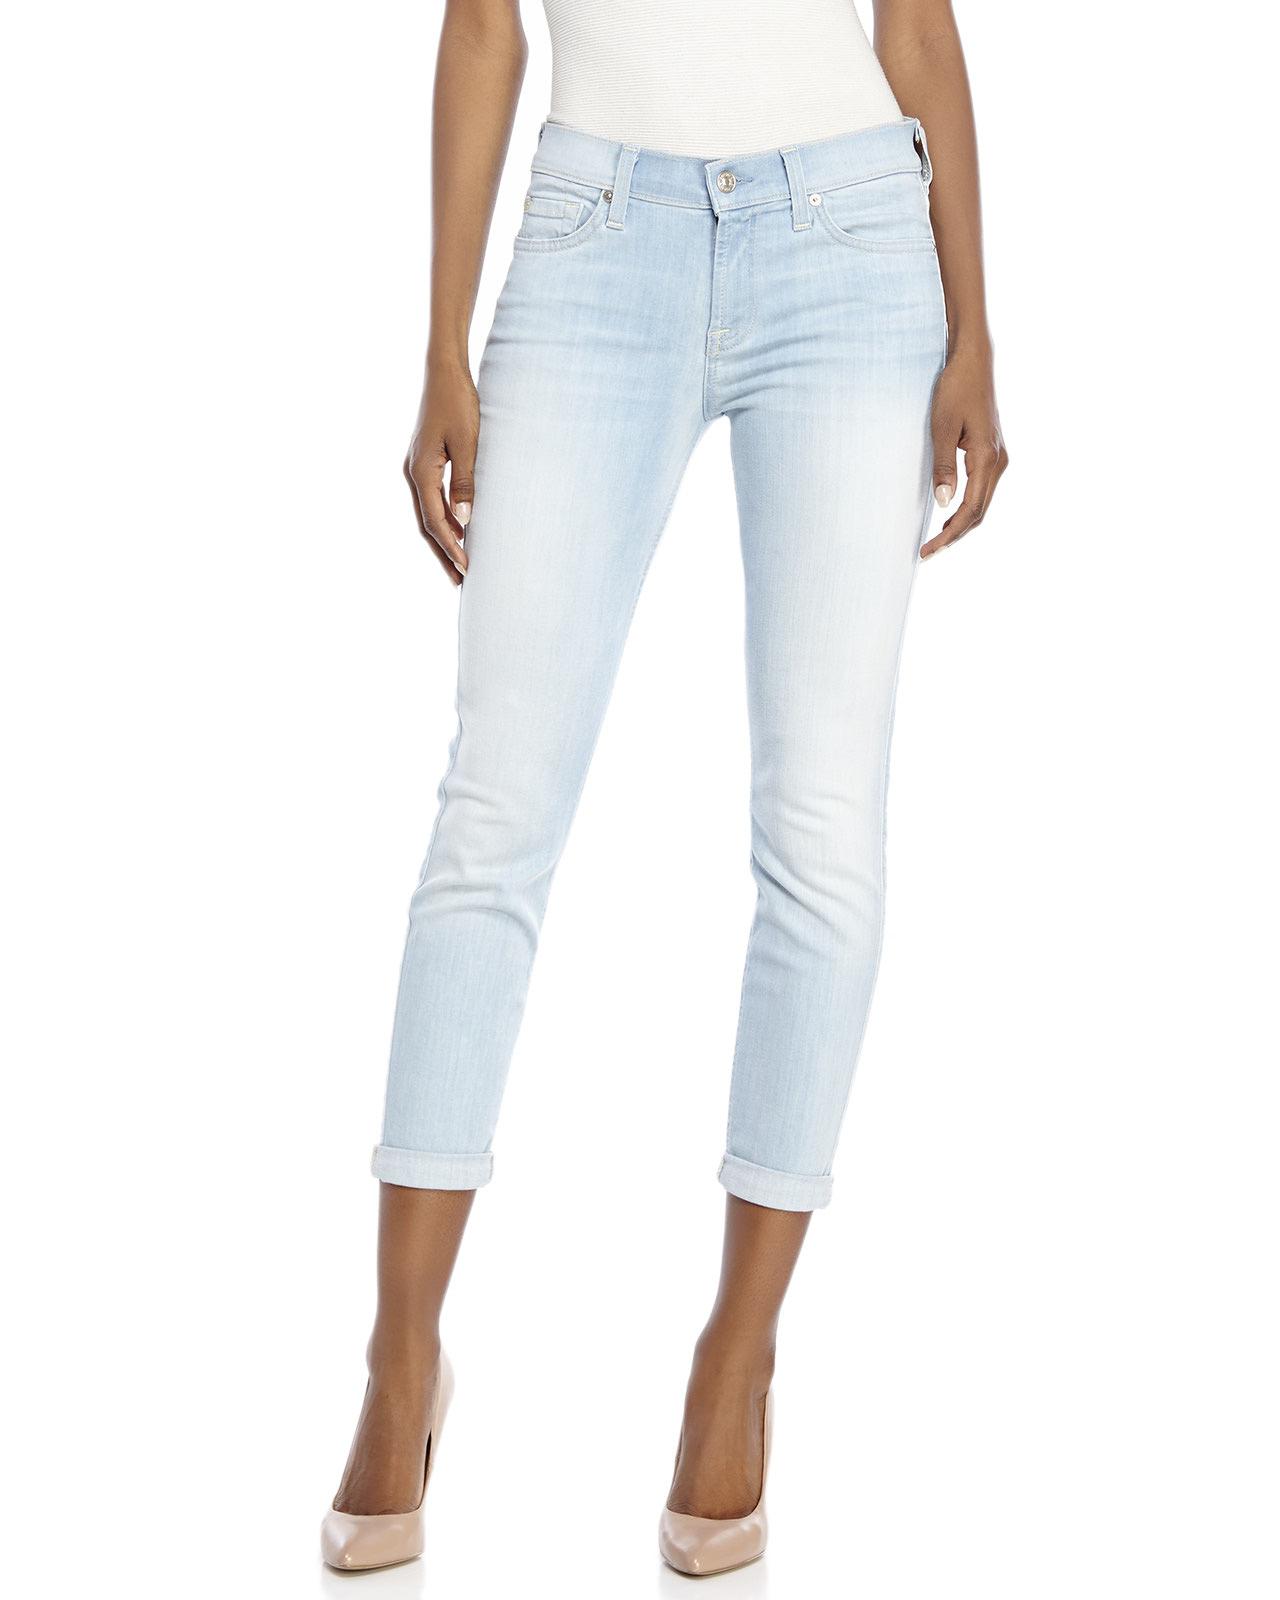 for all mankind the skinny crop roll jeans in blue light wash. Black Bedroom Furniture Sets. Home Design Ideas